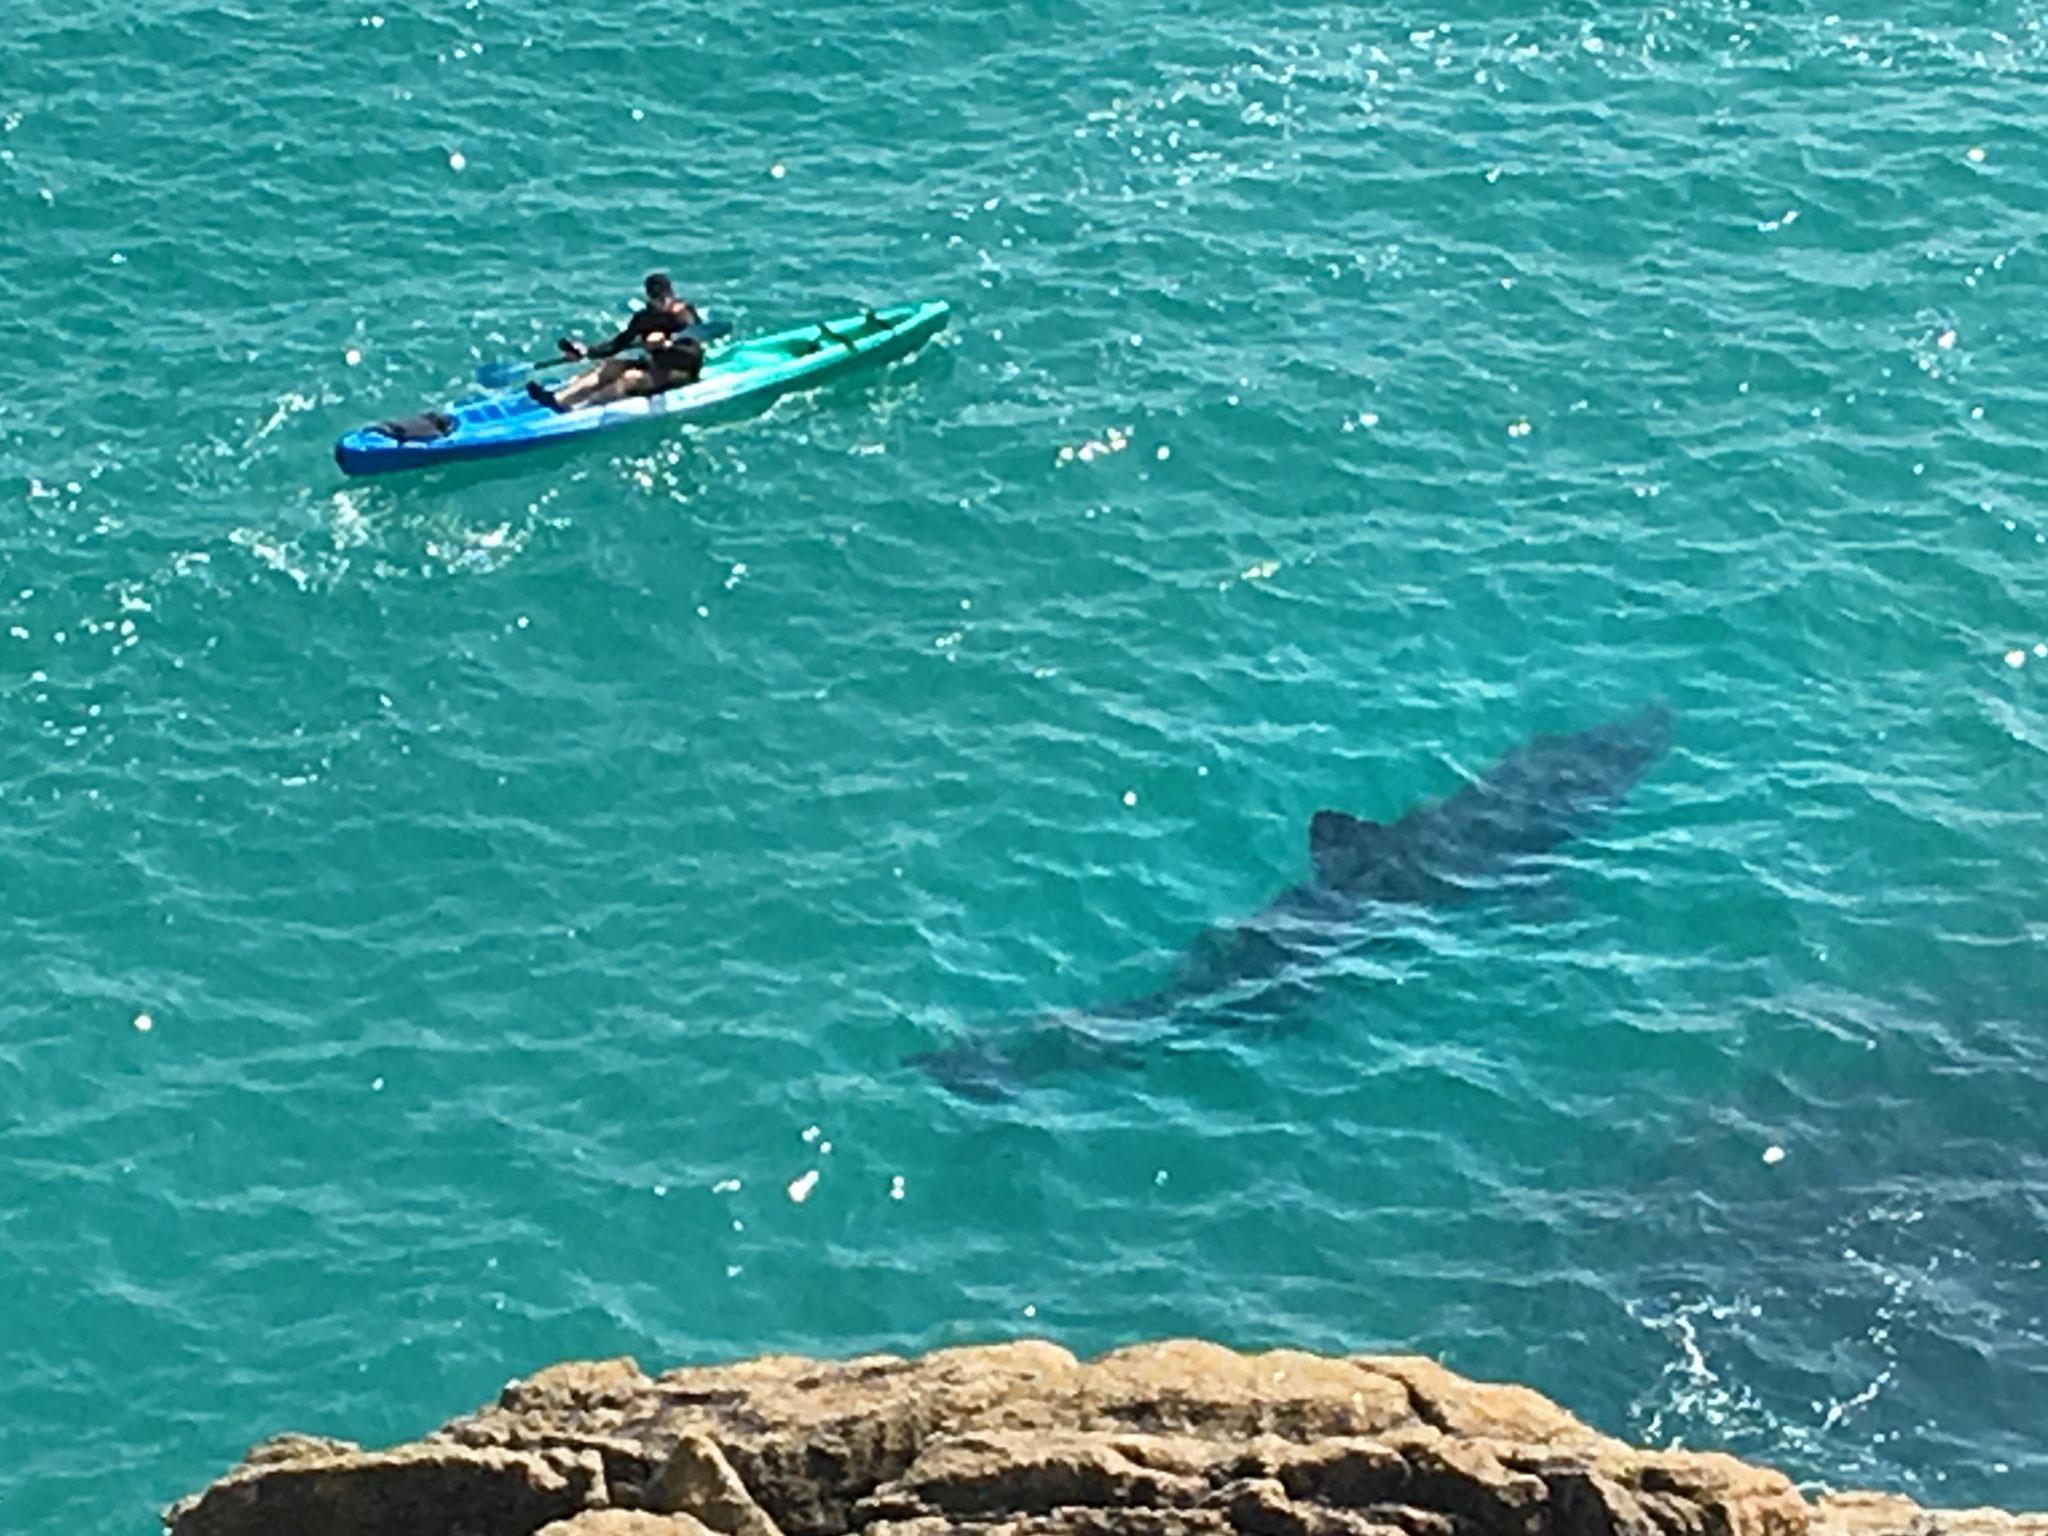 Close encounter between shark and kayaker seen off Cornish